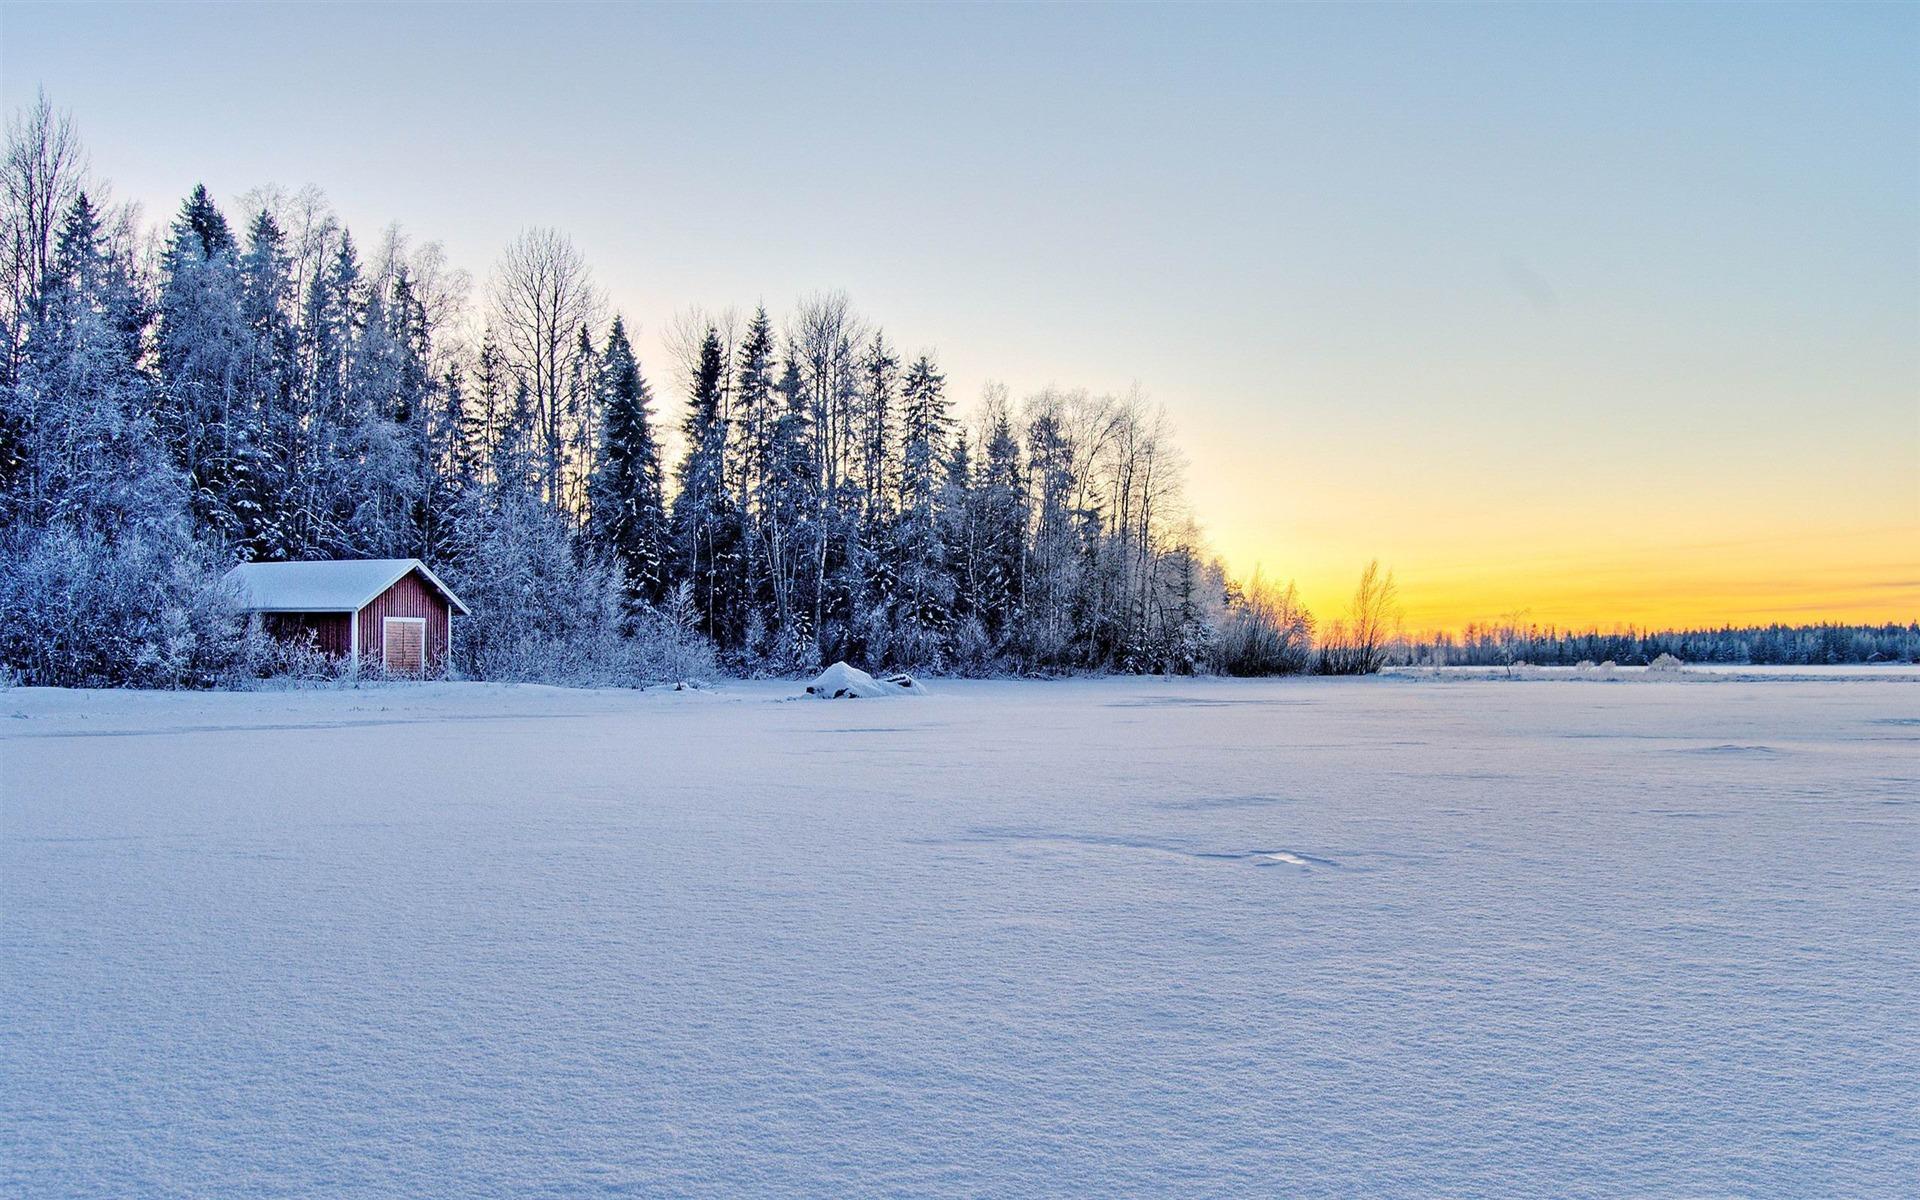 Amazing Wallpaper Love Winter - snow-winter-wallpaper-16  Photograph_483533.jpg